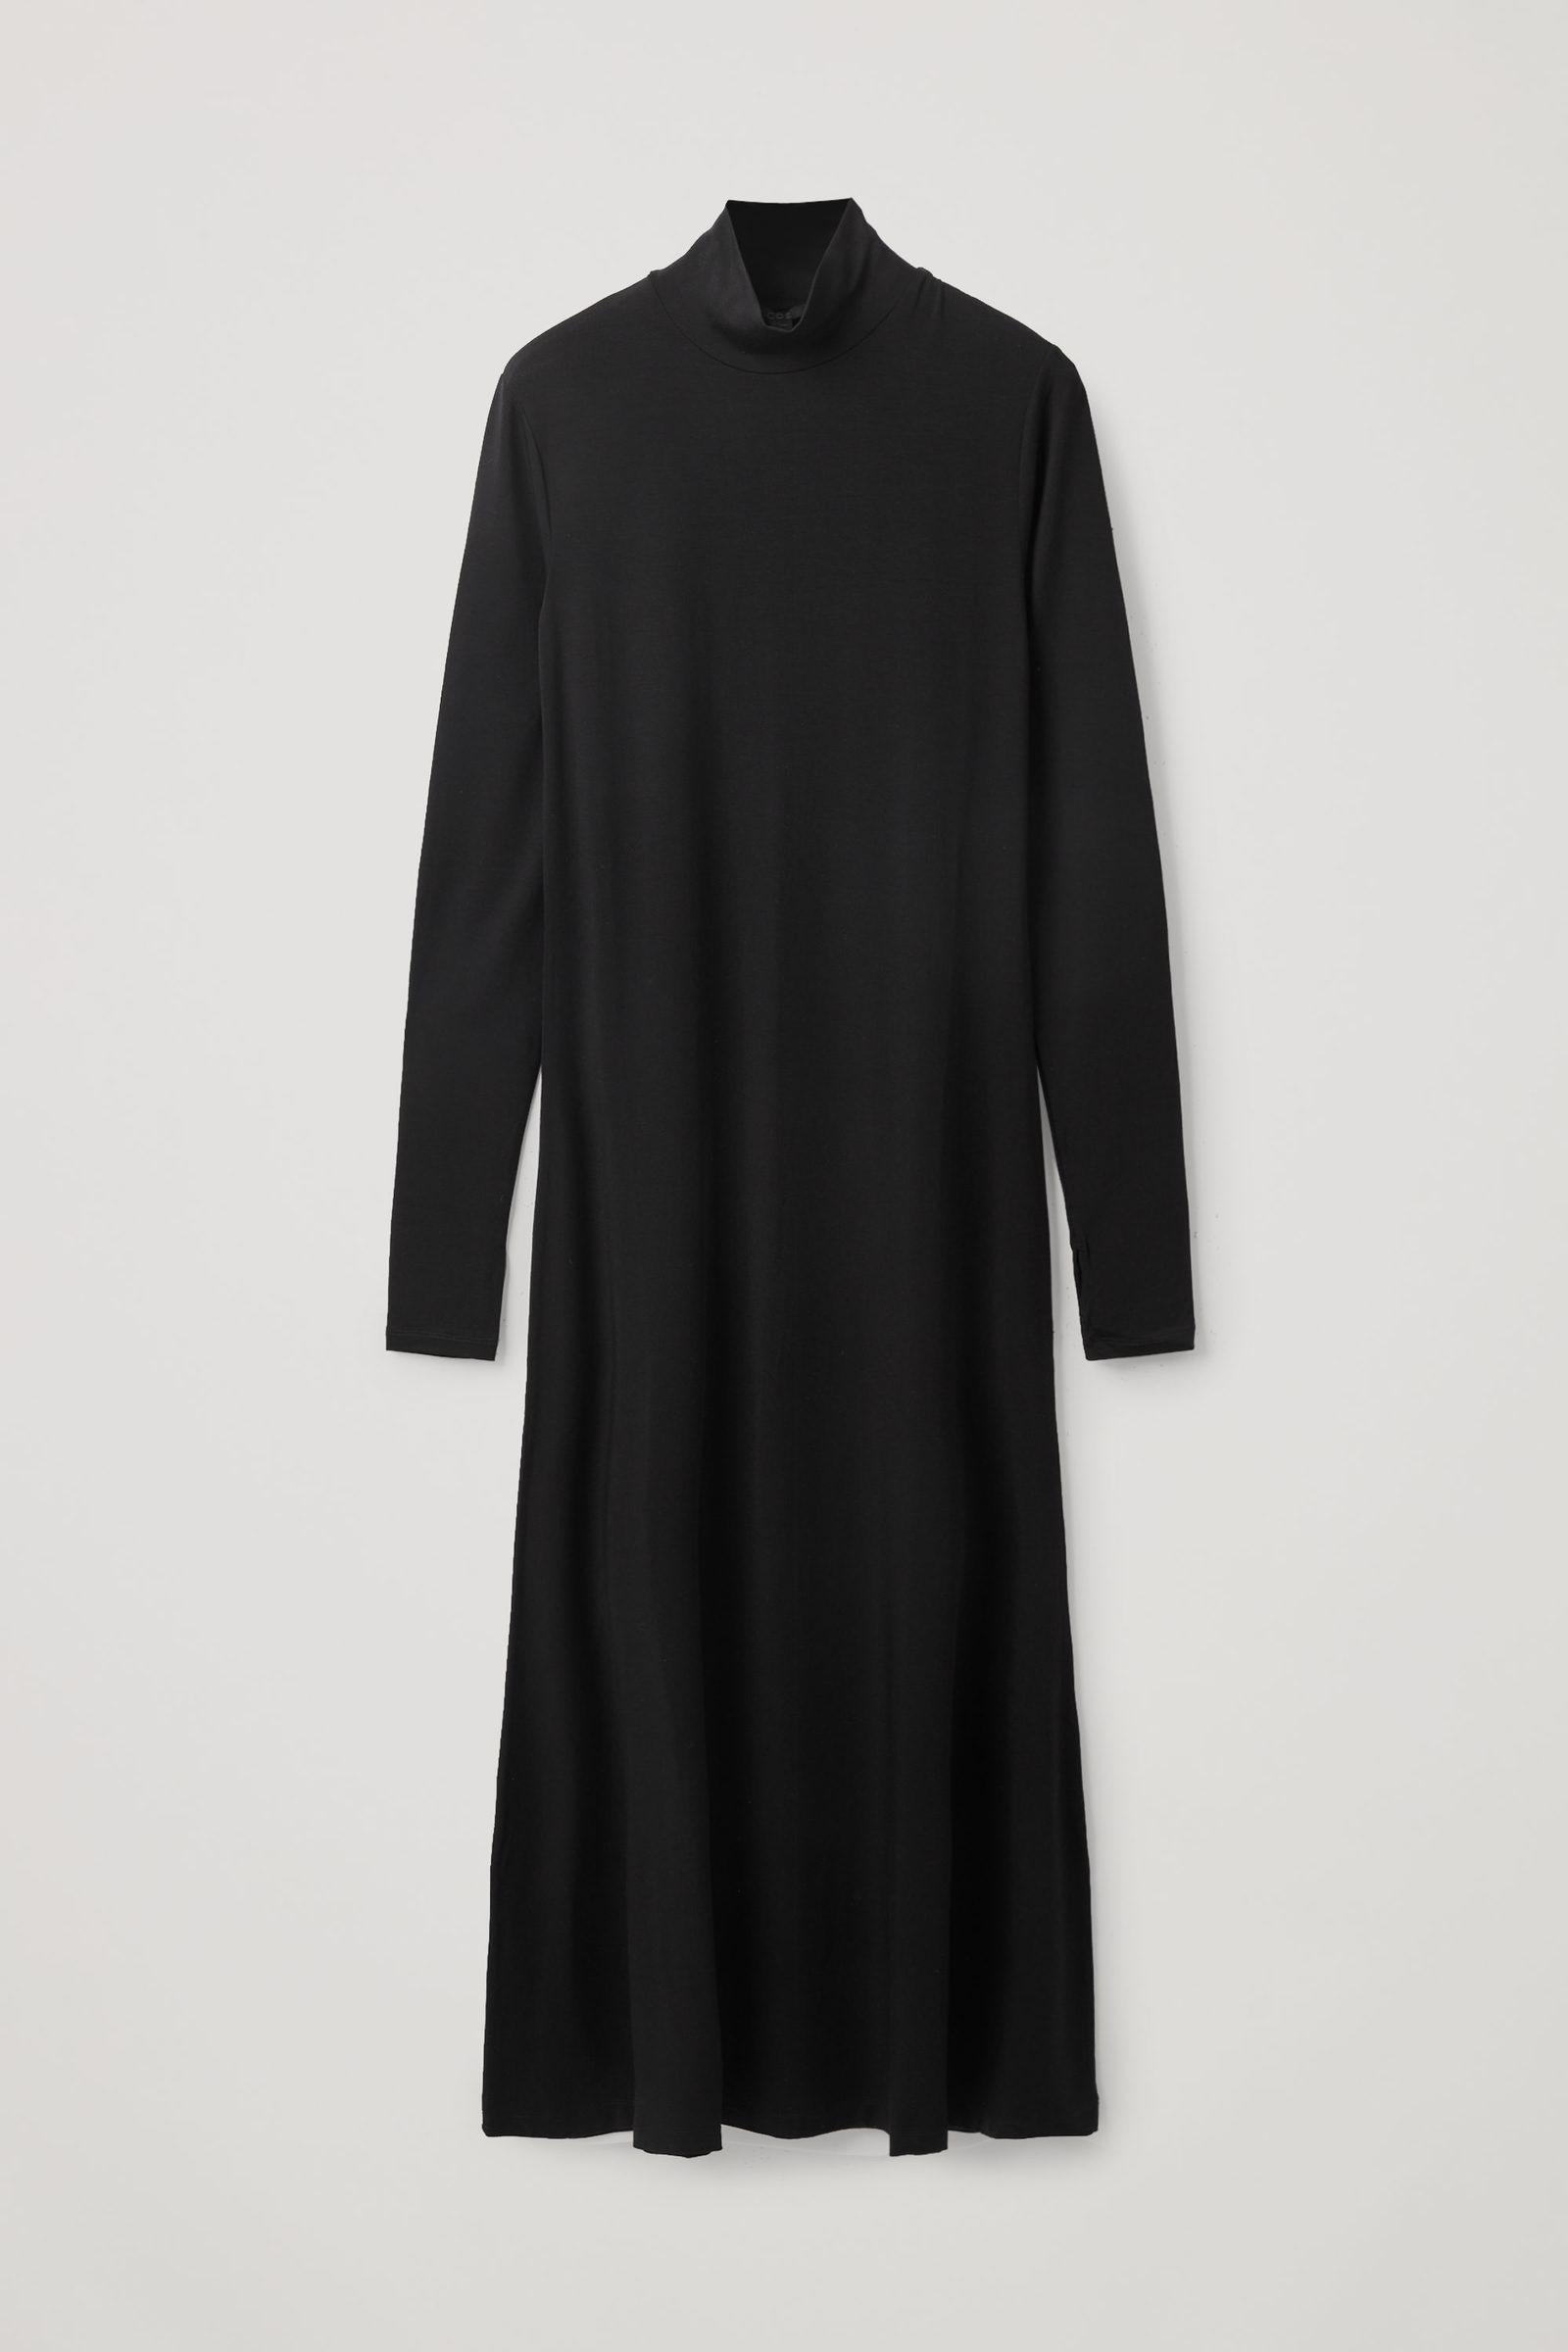 COS 롤넥 맥시 드레스의 블랙컬러 Product입니다.